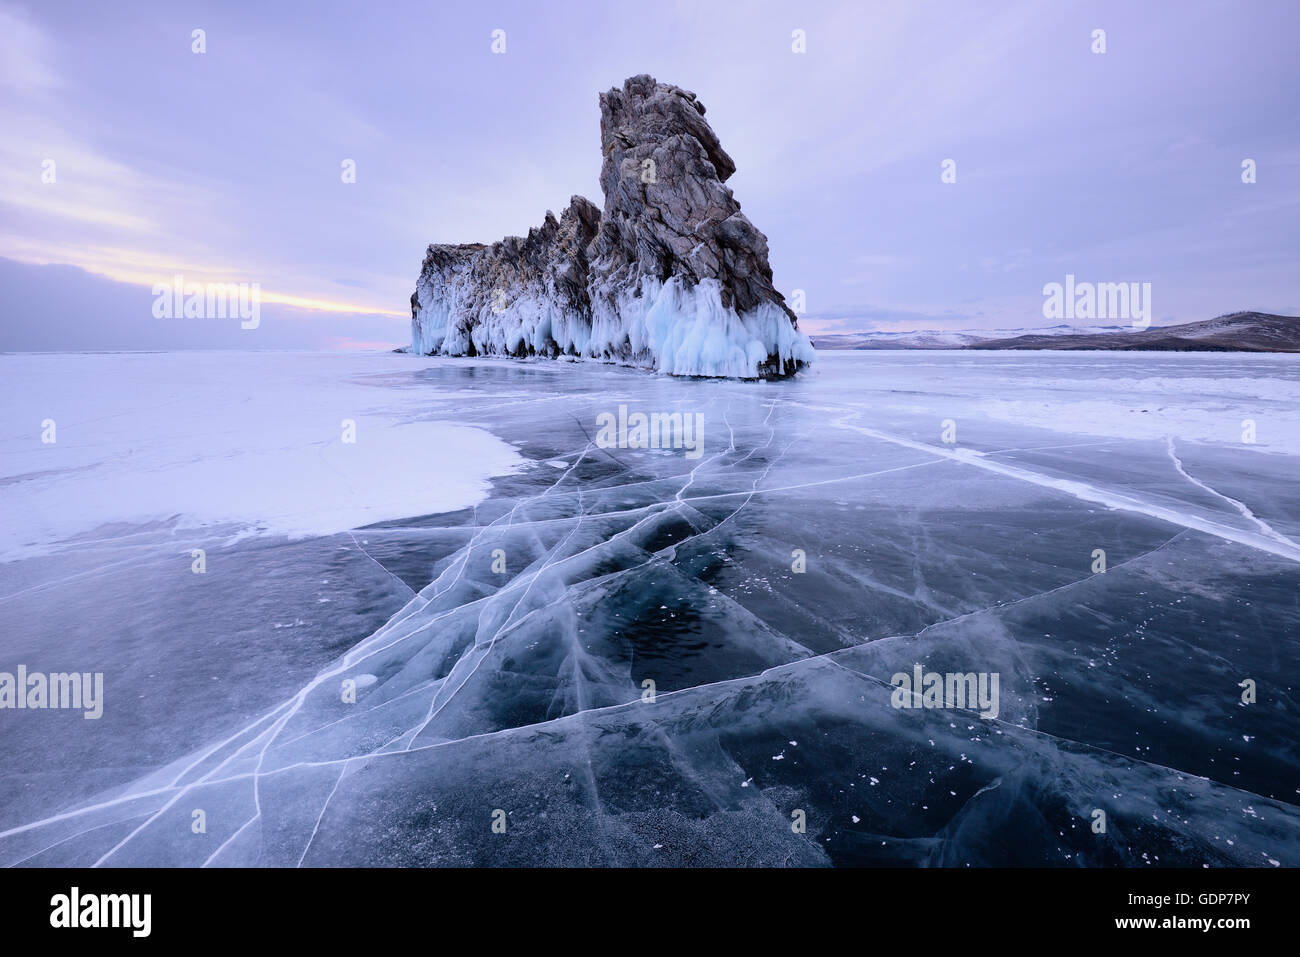 View of Ogoy Island on frozen Baikal Lake, Olkhon Island, Siberia, Russia - Stock Image